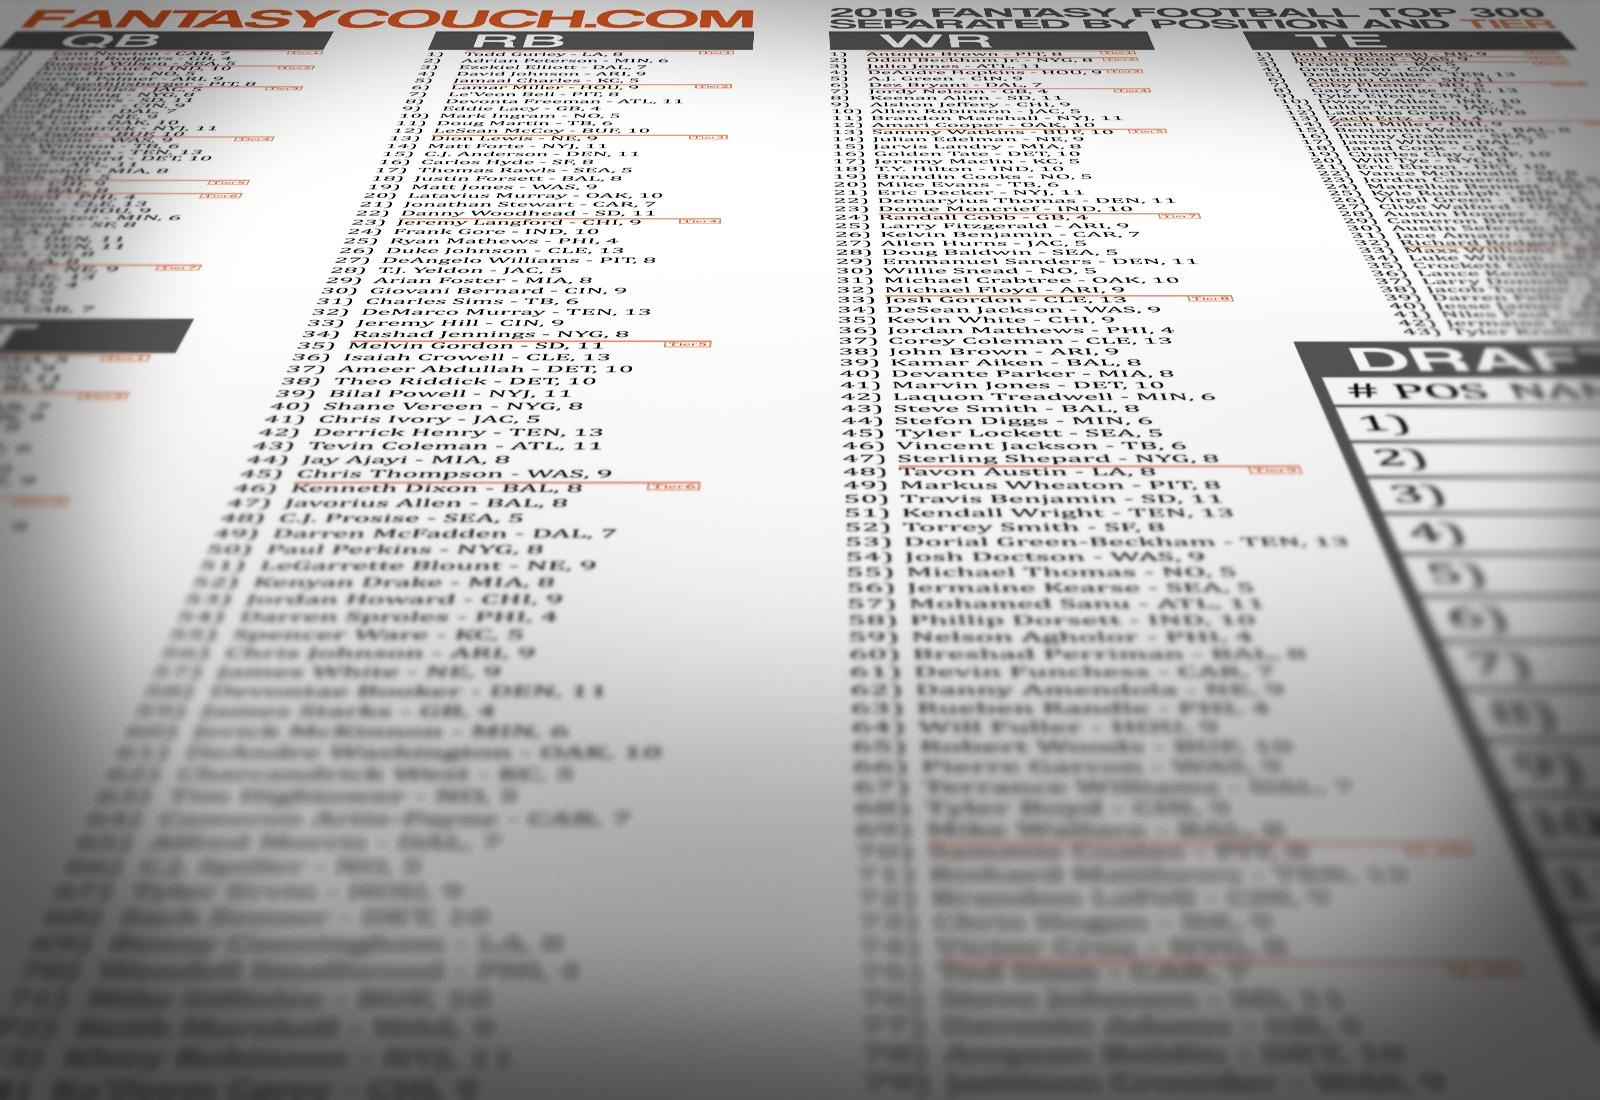 Top 300 List - Fantasy Football 2018 Cheat Sheet - Fantasy Football Draft Sheets Printable Free